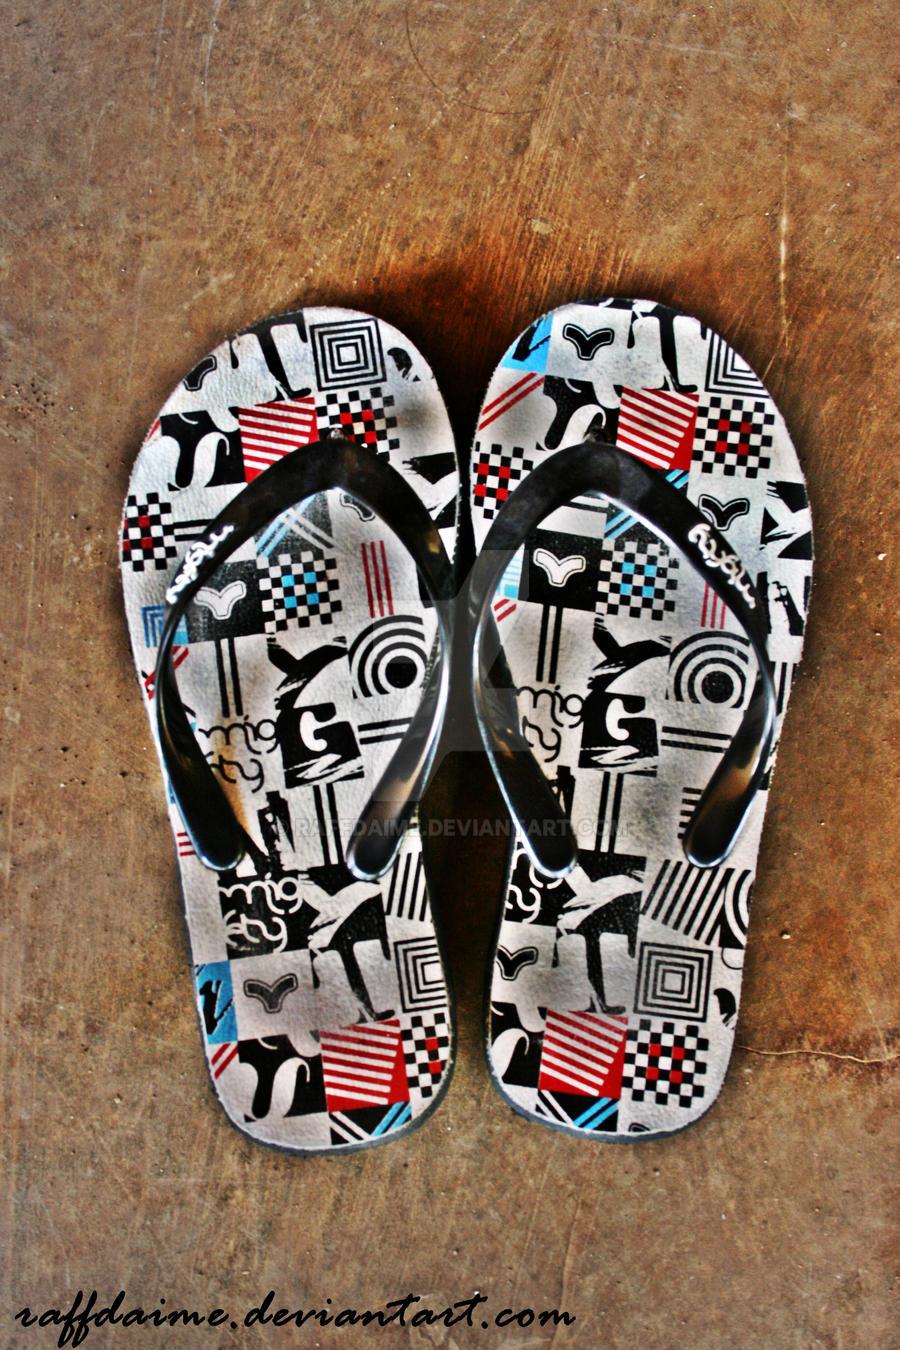 Sandals by raffdaime